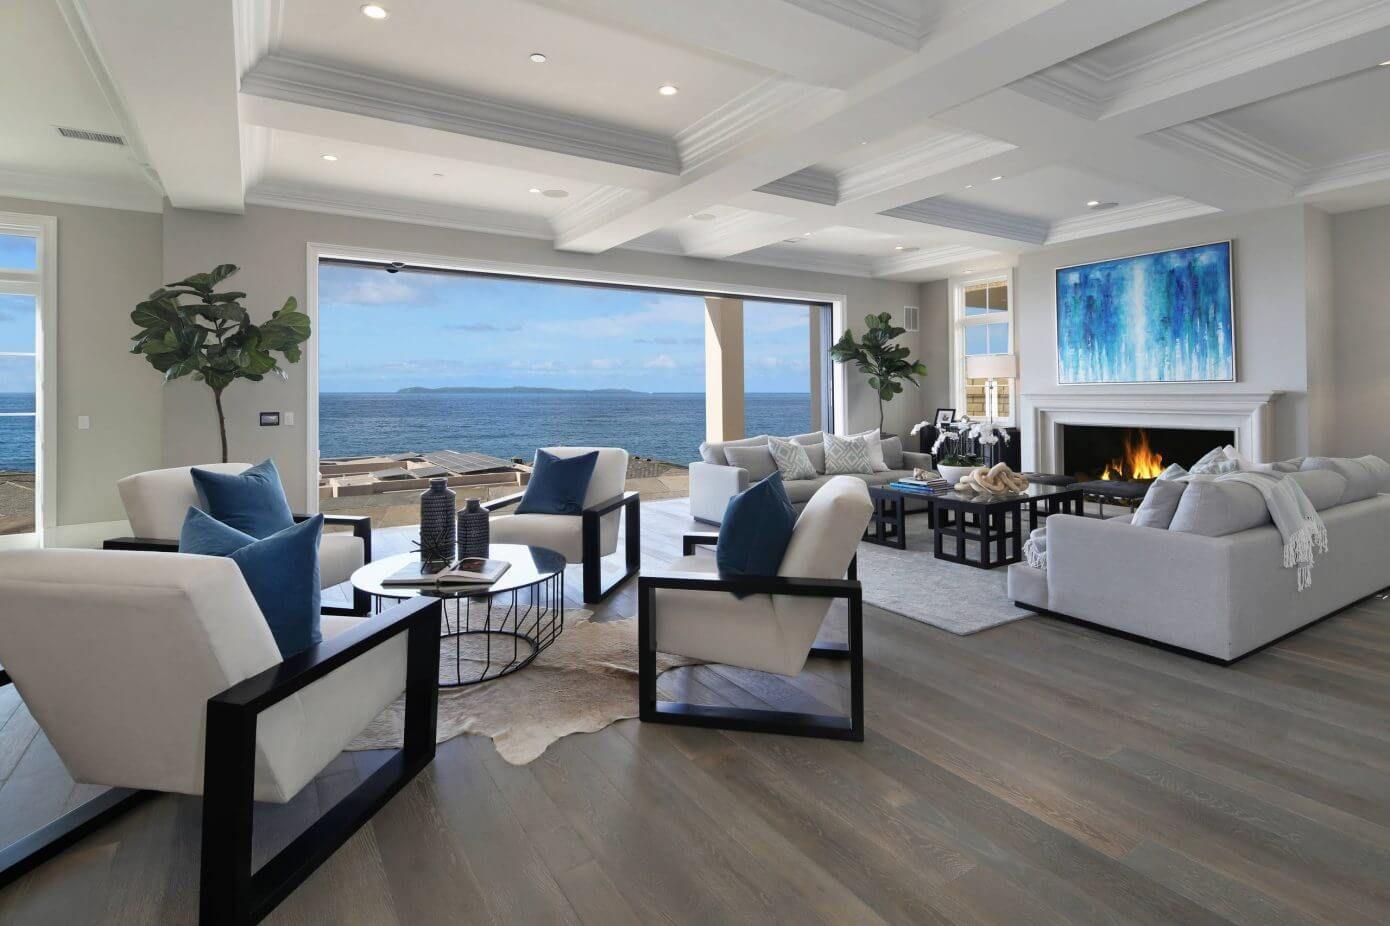 Beachview House By Brandon Architects Homeadore Beach House Living Room Beach House Interior Beach House Interior Design